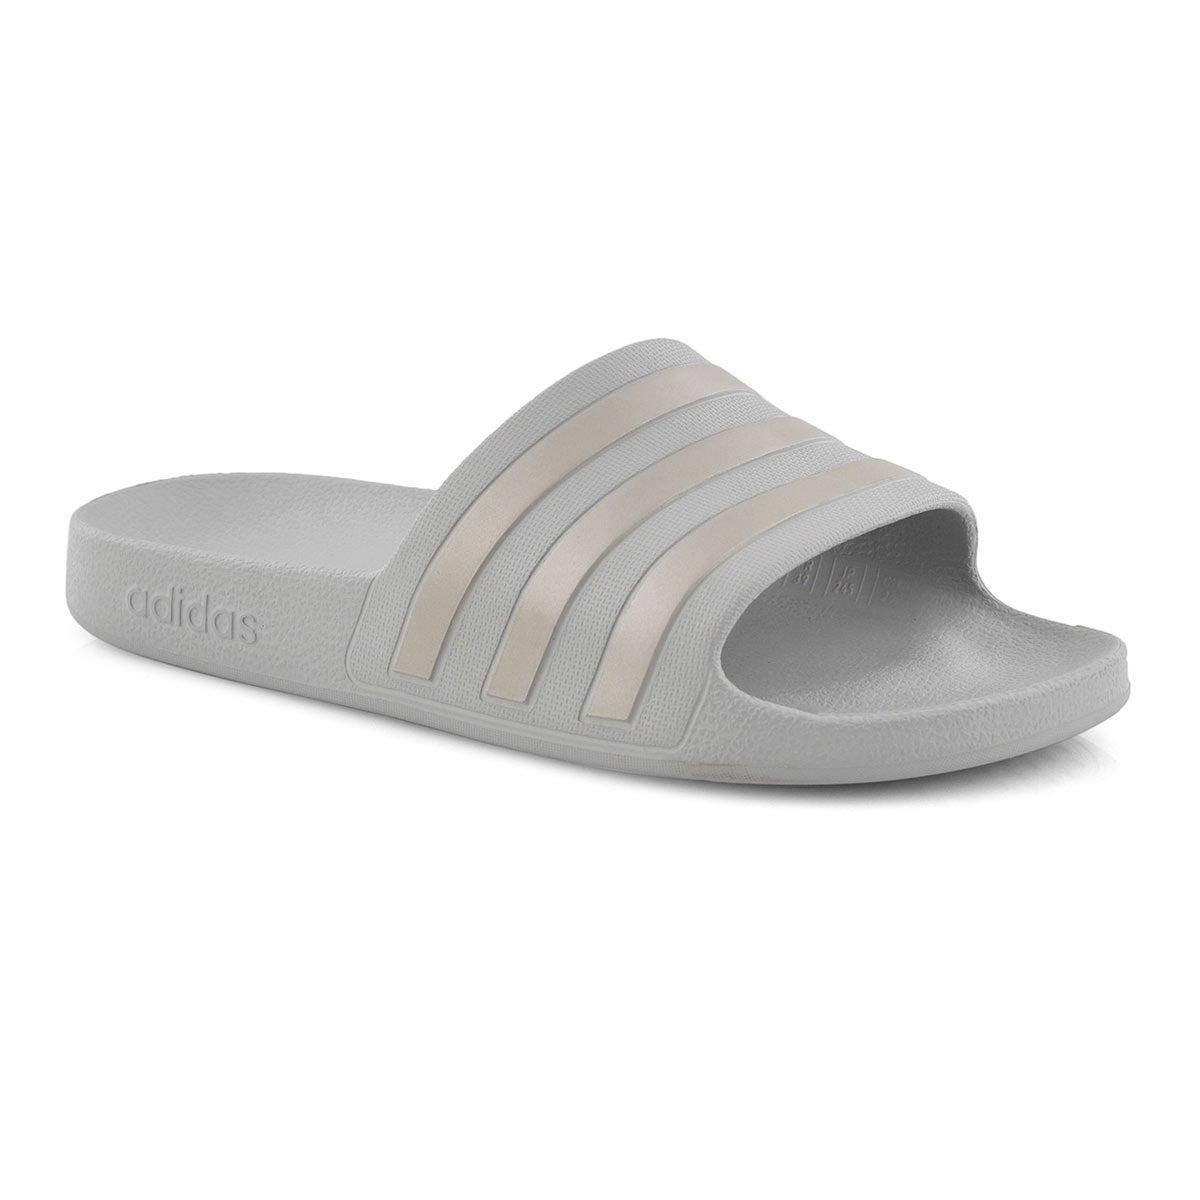 Lds Adilette Aqua grey slide sandal